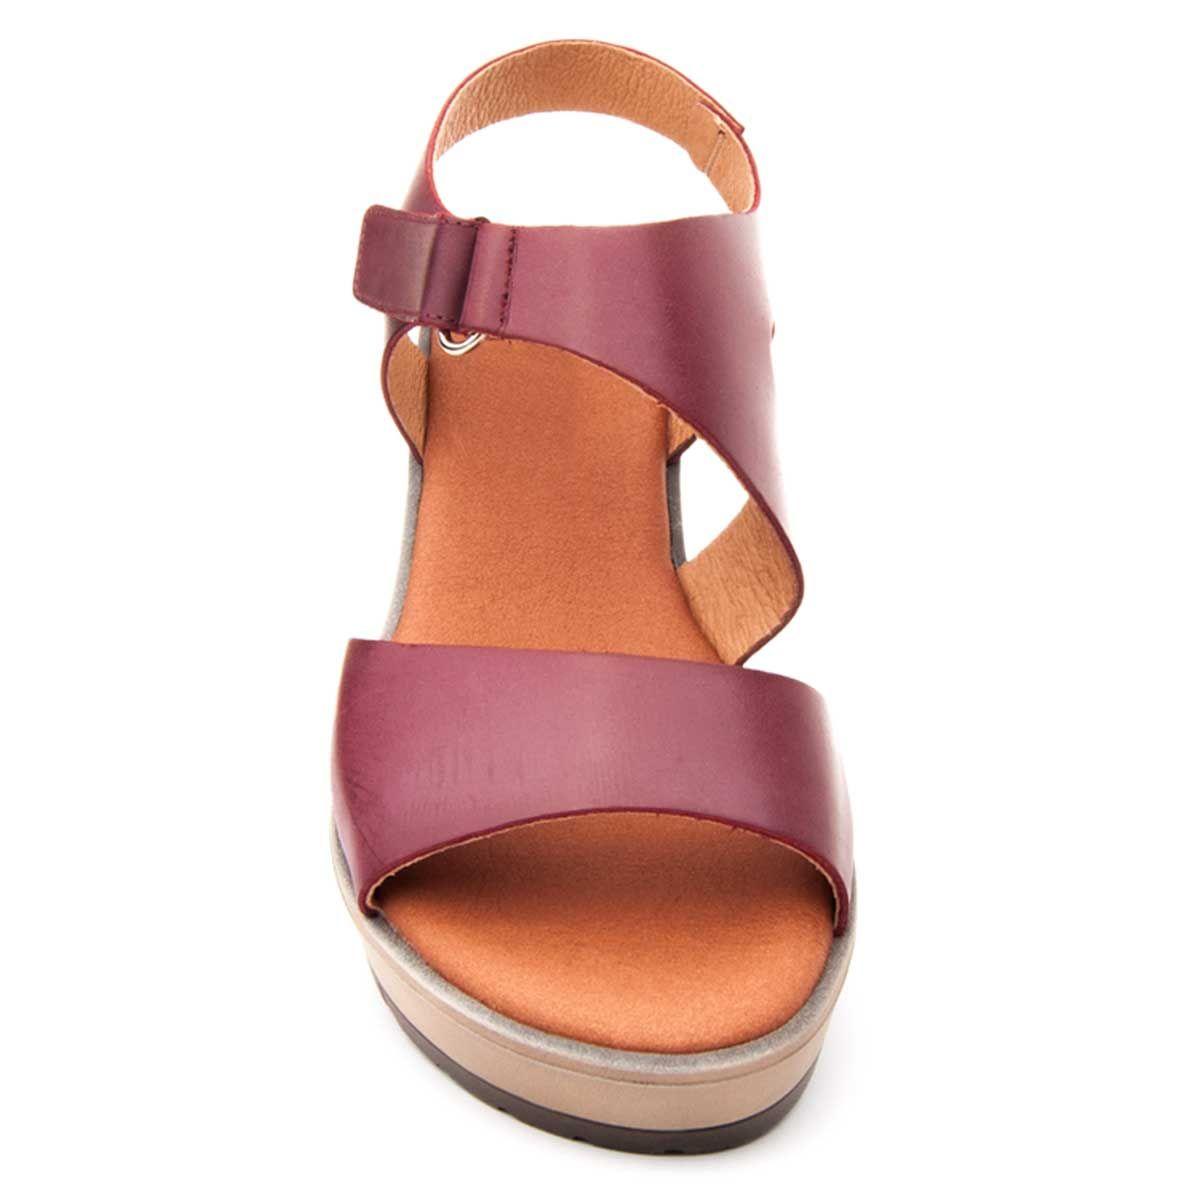 Purapiel Wedge Sandal in Bordo